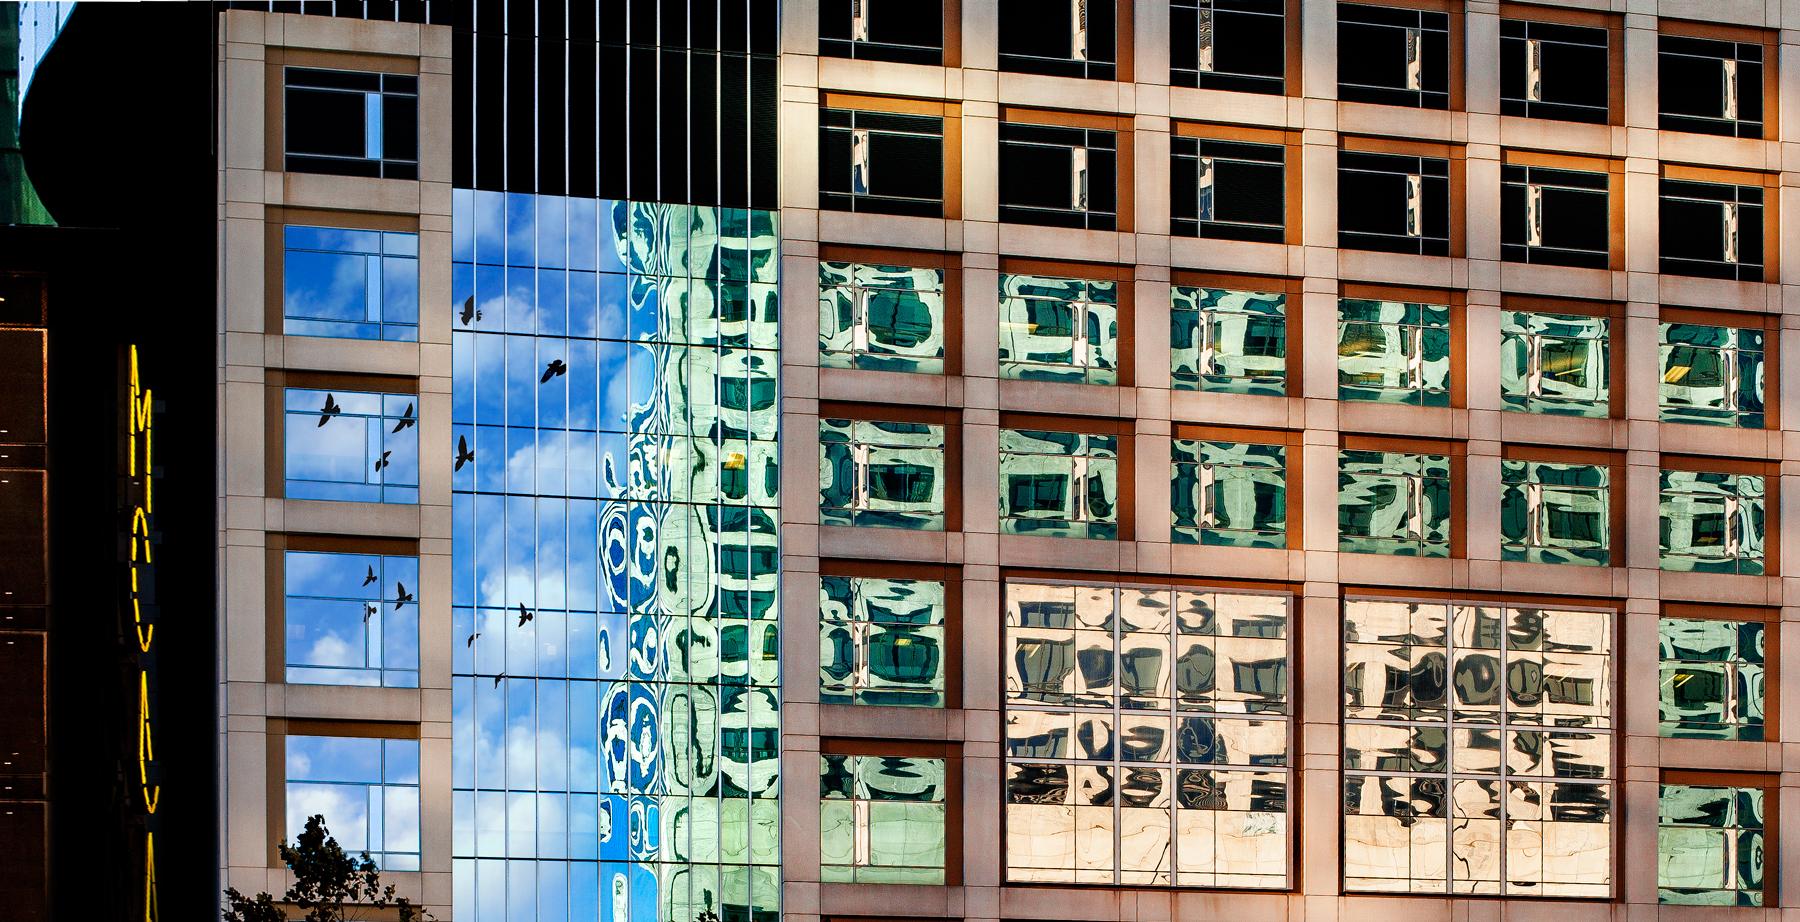 Cheryl_Rossum_Reflections_Chicago_2.jpg